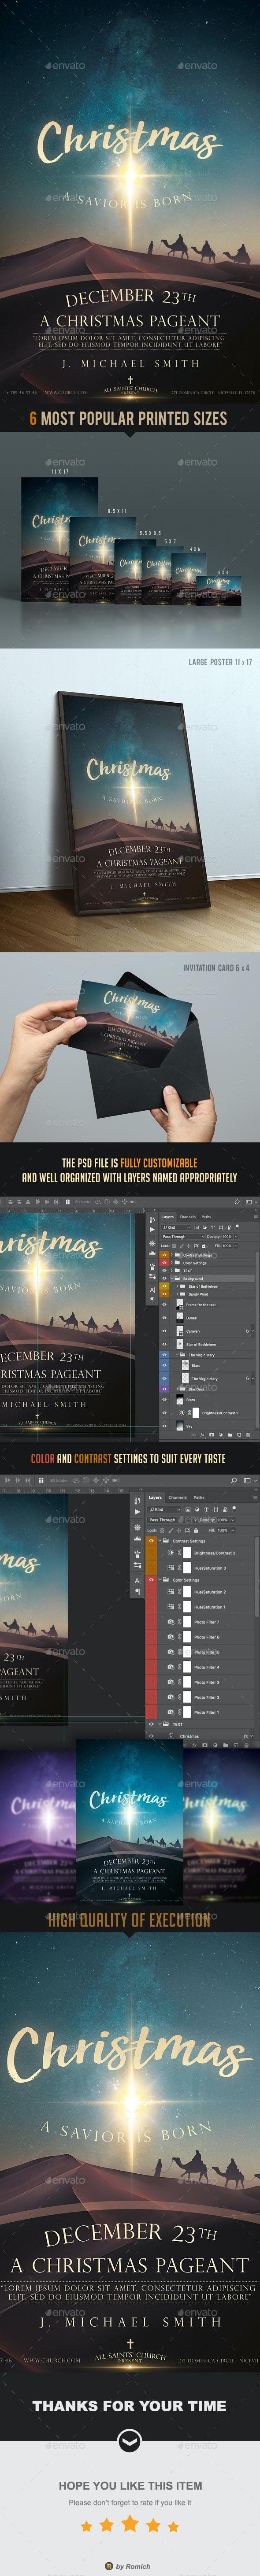 Christmas Church Poster & Flyer - Church Flyers